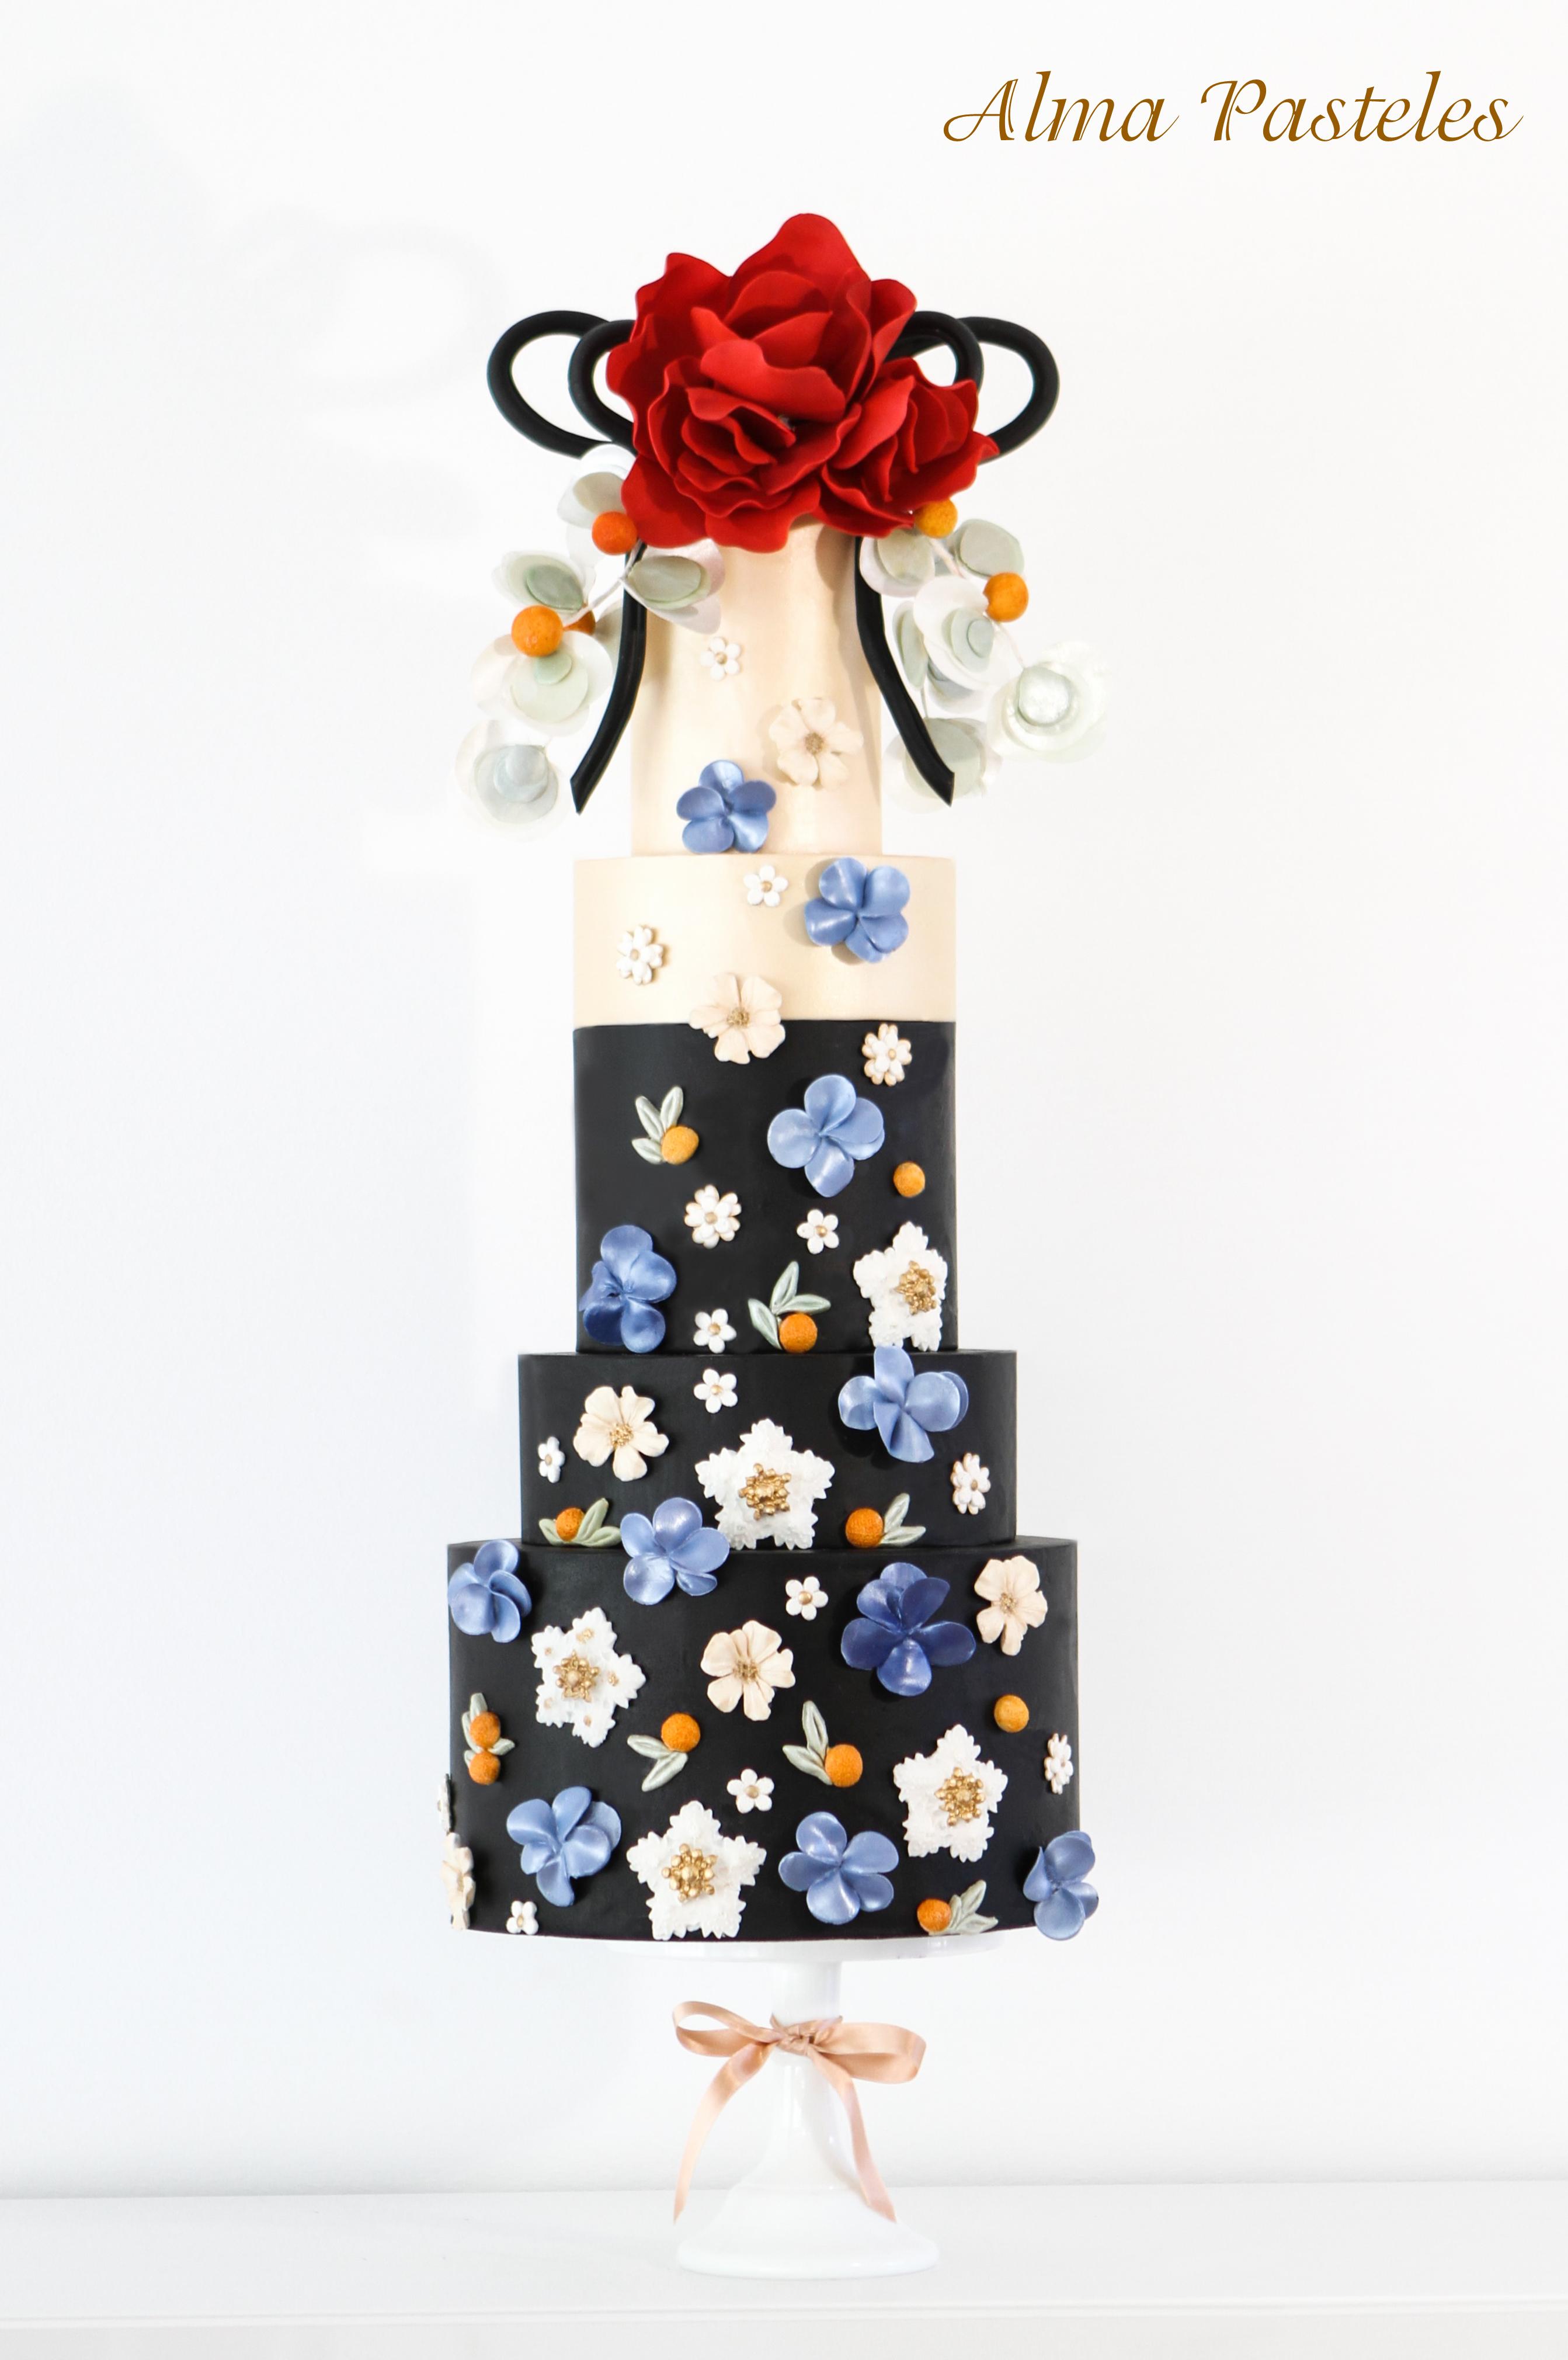 Ivory and black wedding cake with blue sugar flower appliqué